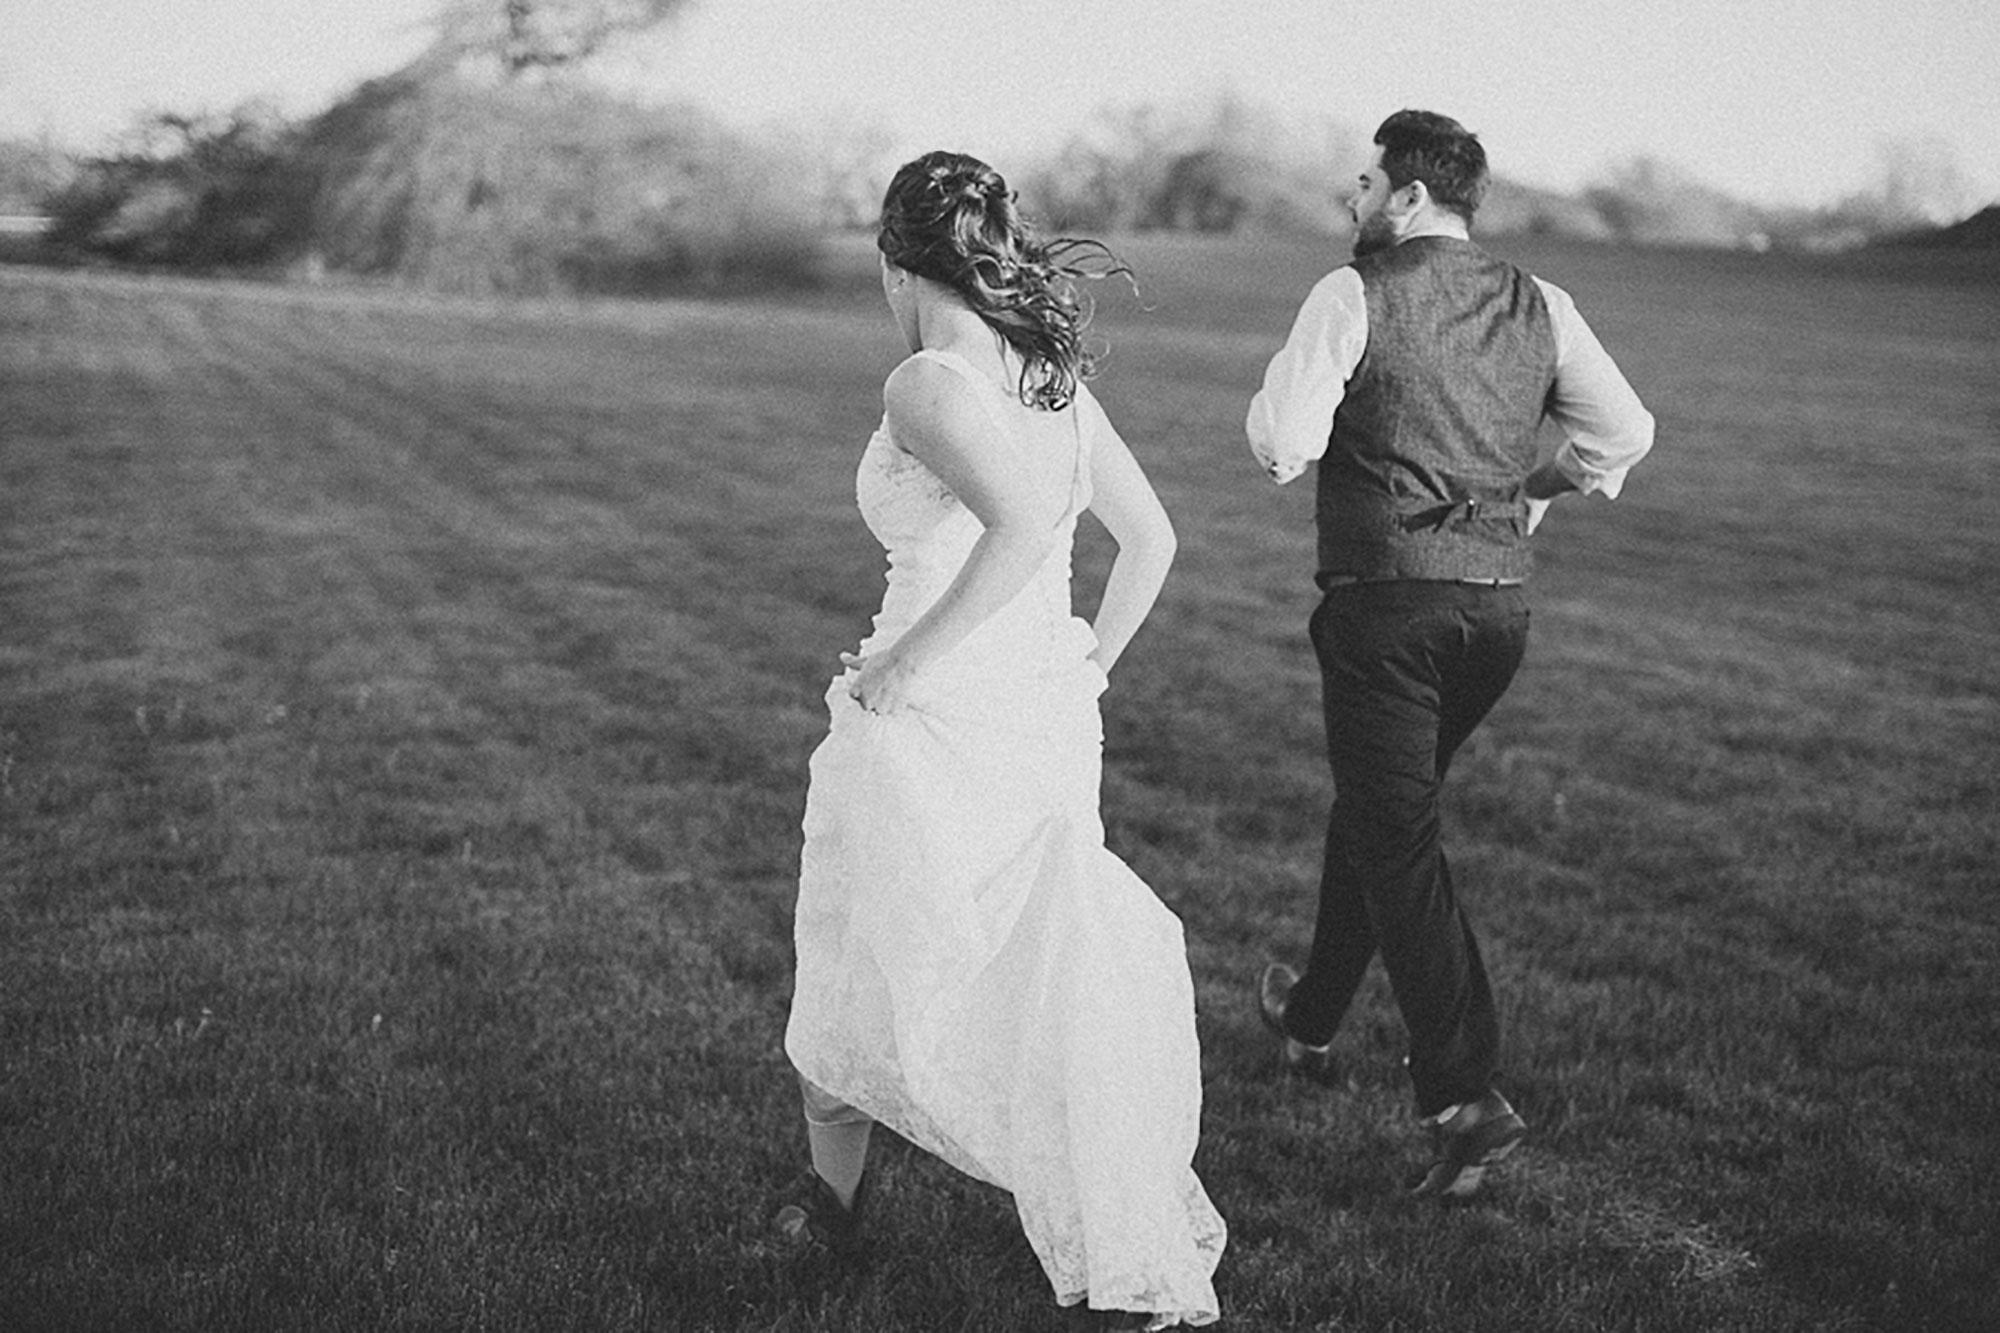 Navy-Hall-Wedding-Vineyard-Bride-Photo-By-Andrew-Mark-Photography-049.jpg